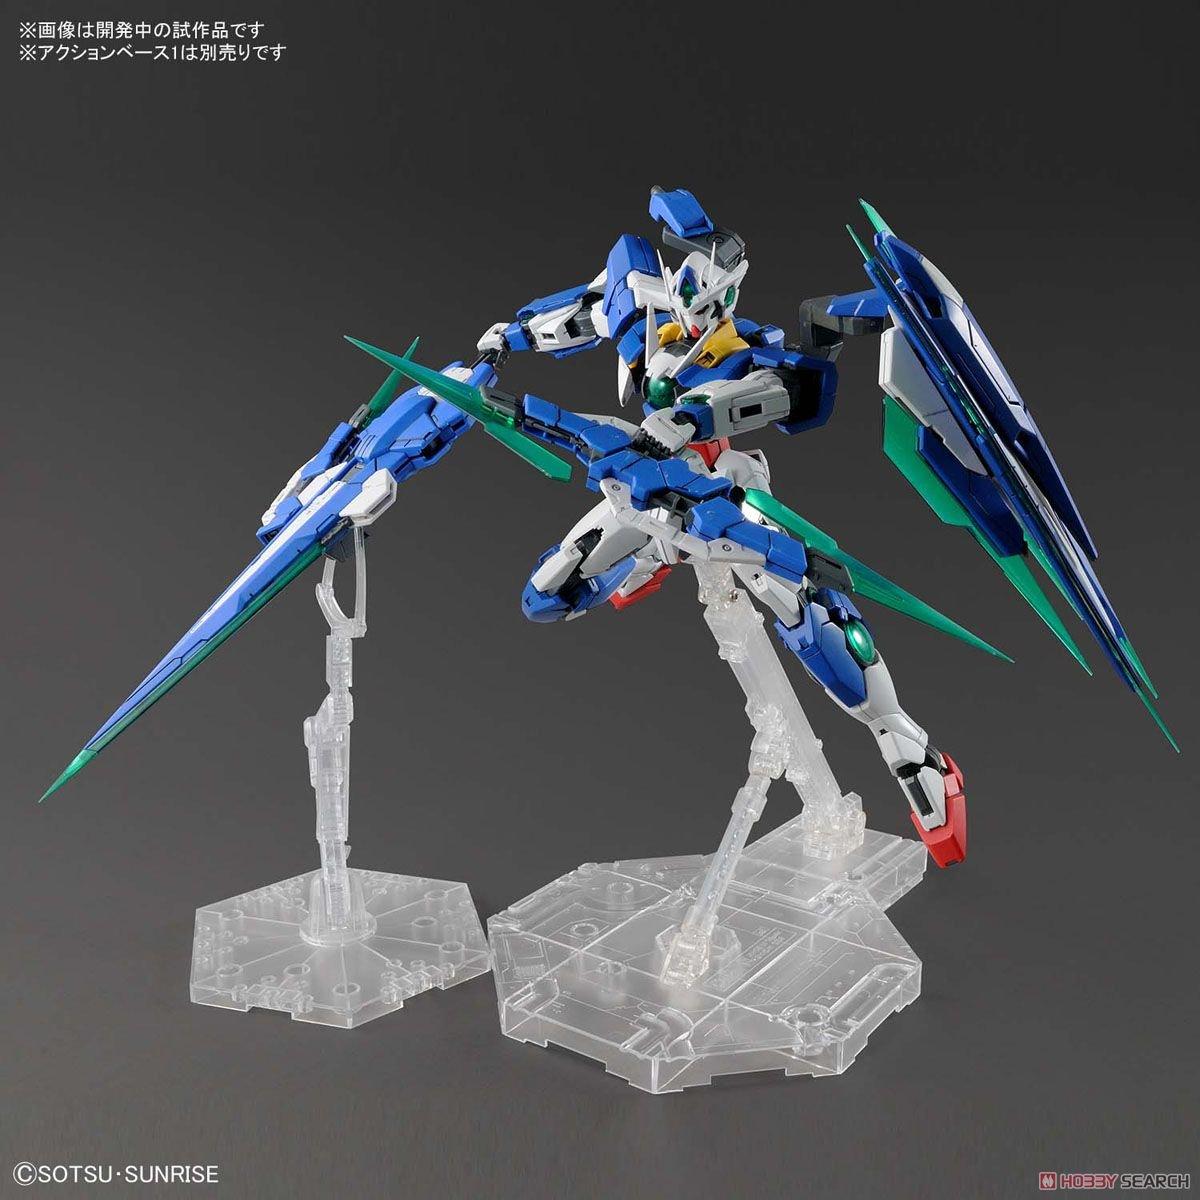 Bandai Mg Master Grade 1 100 00 Qant Full Saber Gundam 144 Hgoo Gnt 0000 Qanta Model Kits